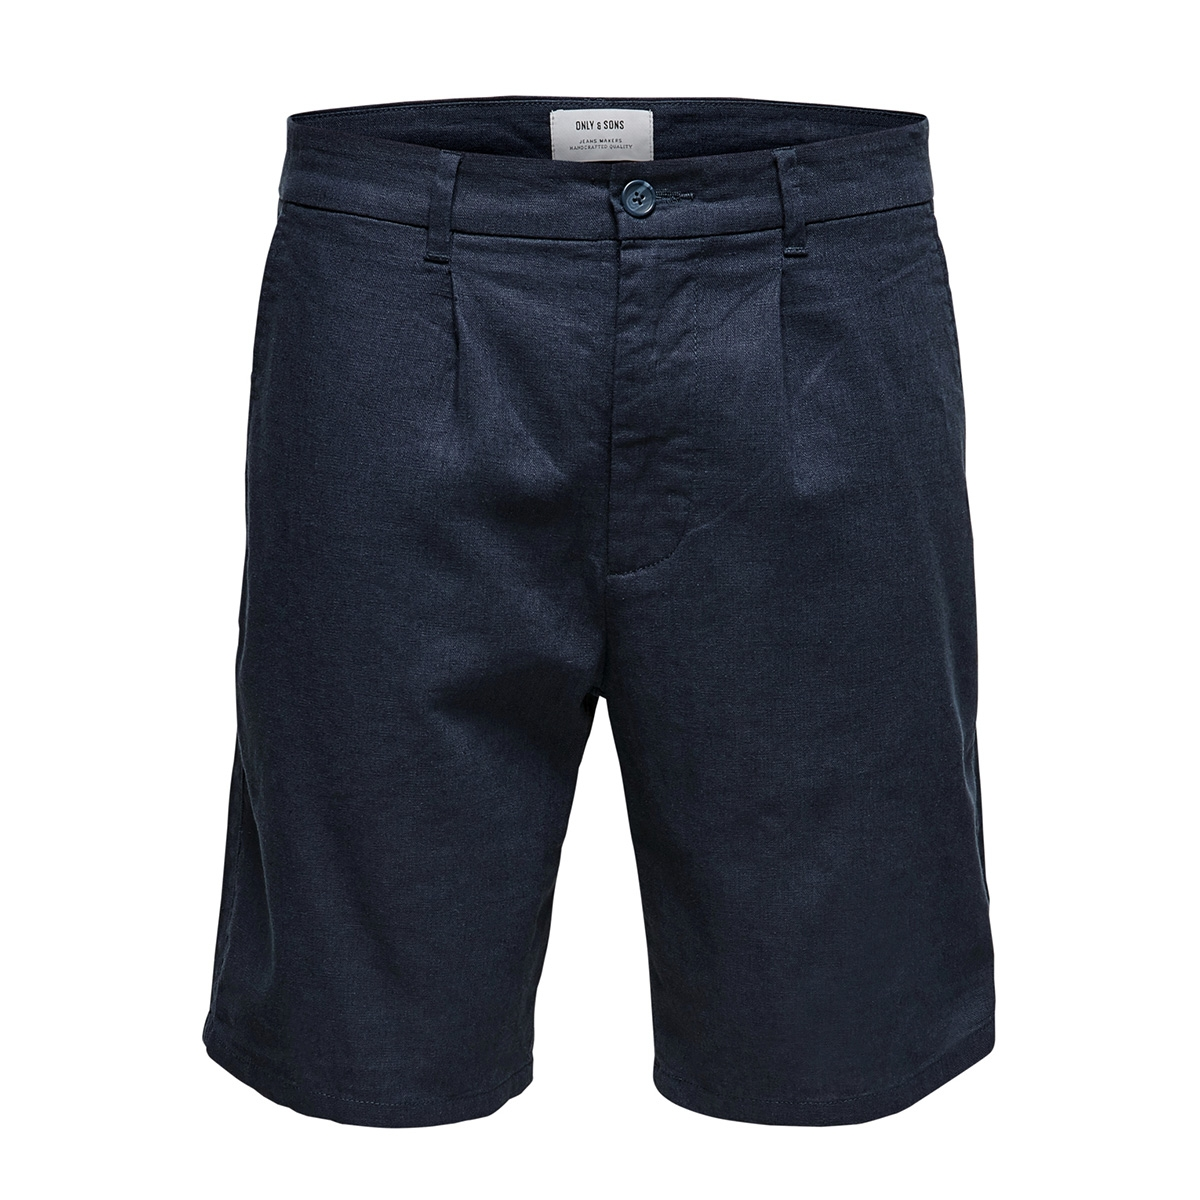 c45b5177ade onslou linen mix shorts gw 3000 no 22013000 only & sons korte broek ...